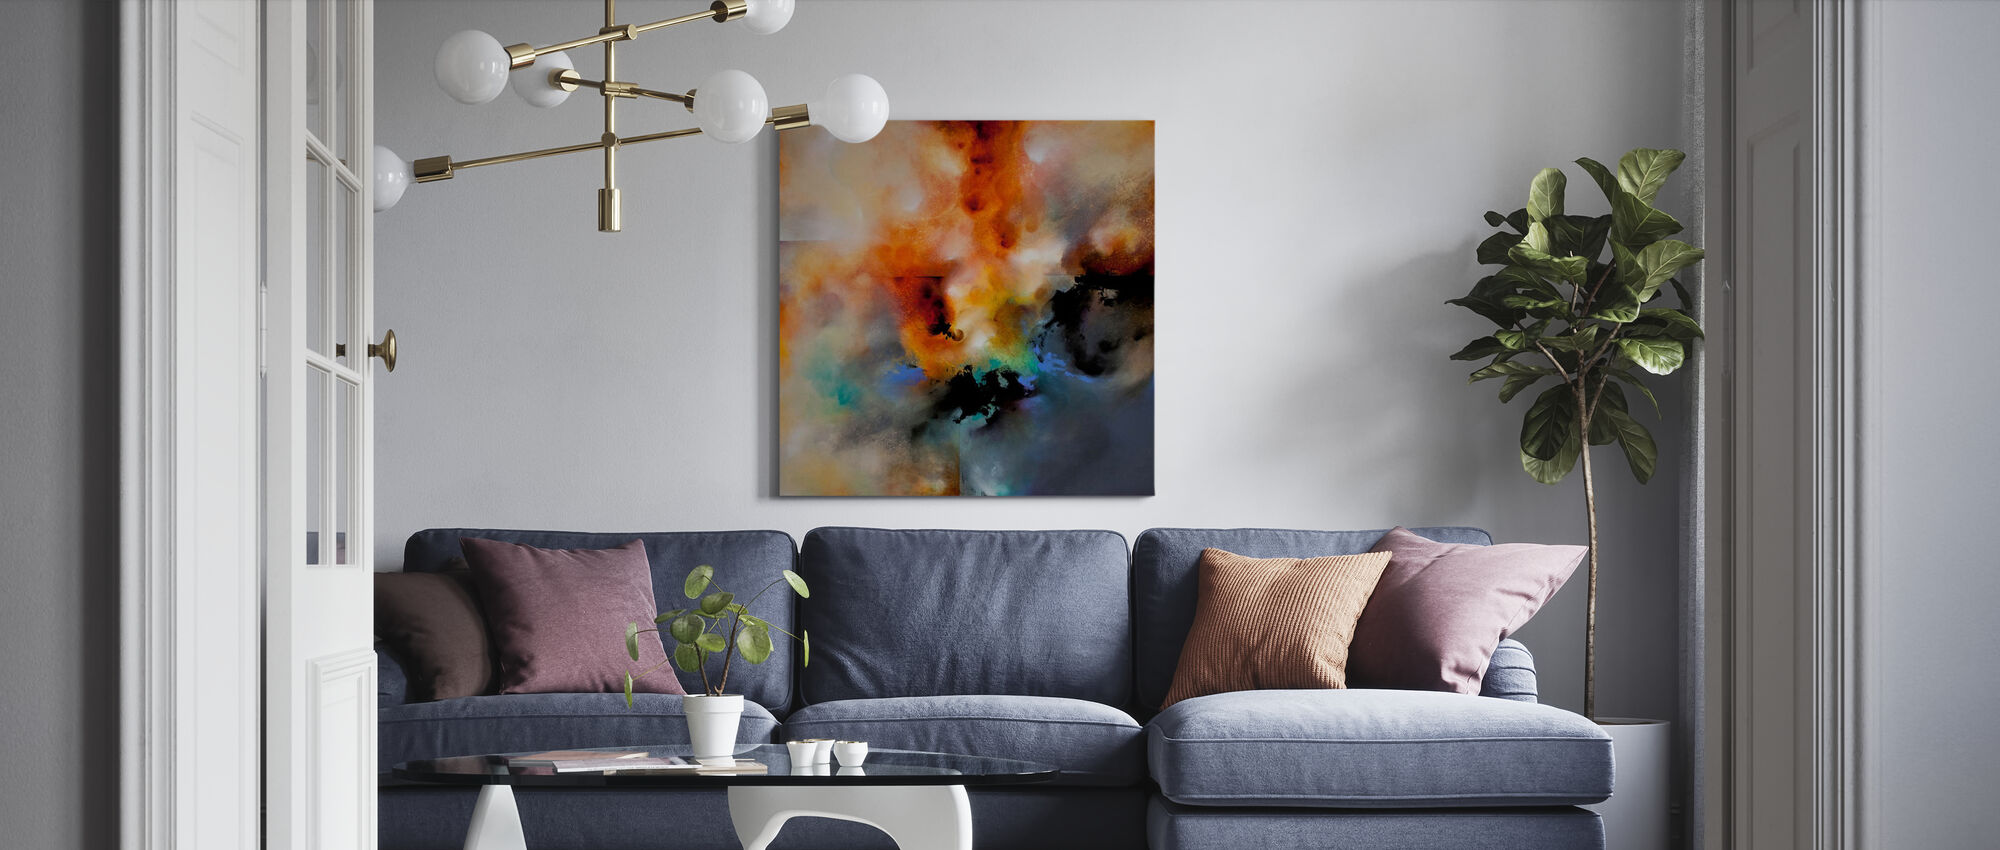 Magiska himmel - Canvastavla - Vardagsrum